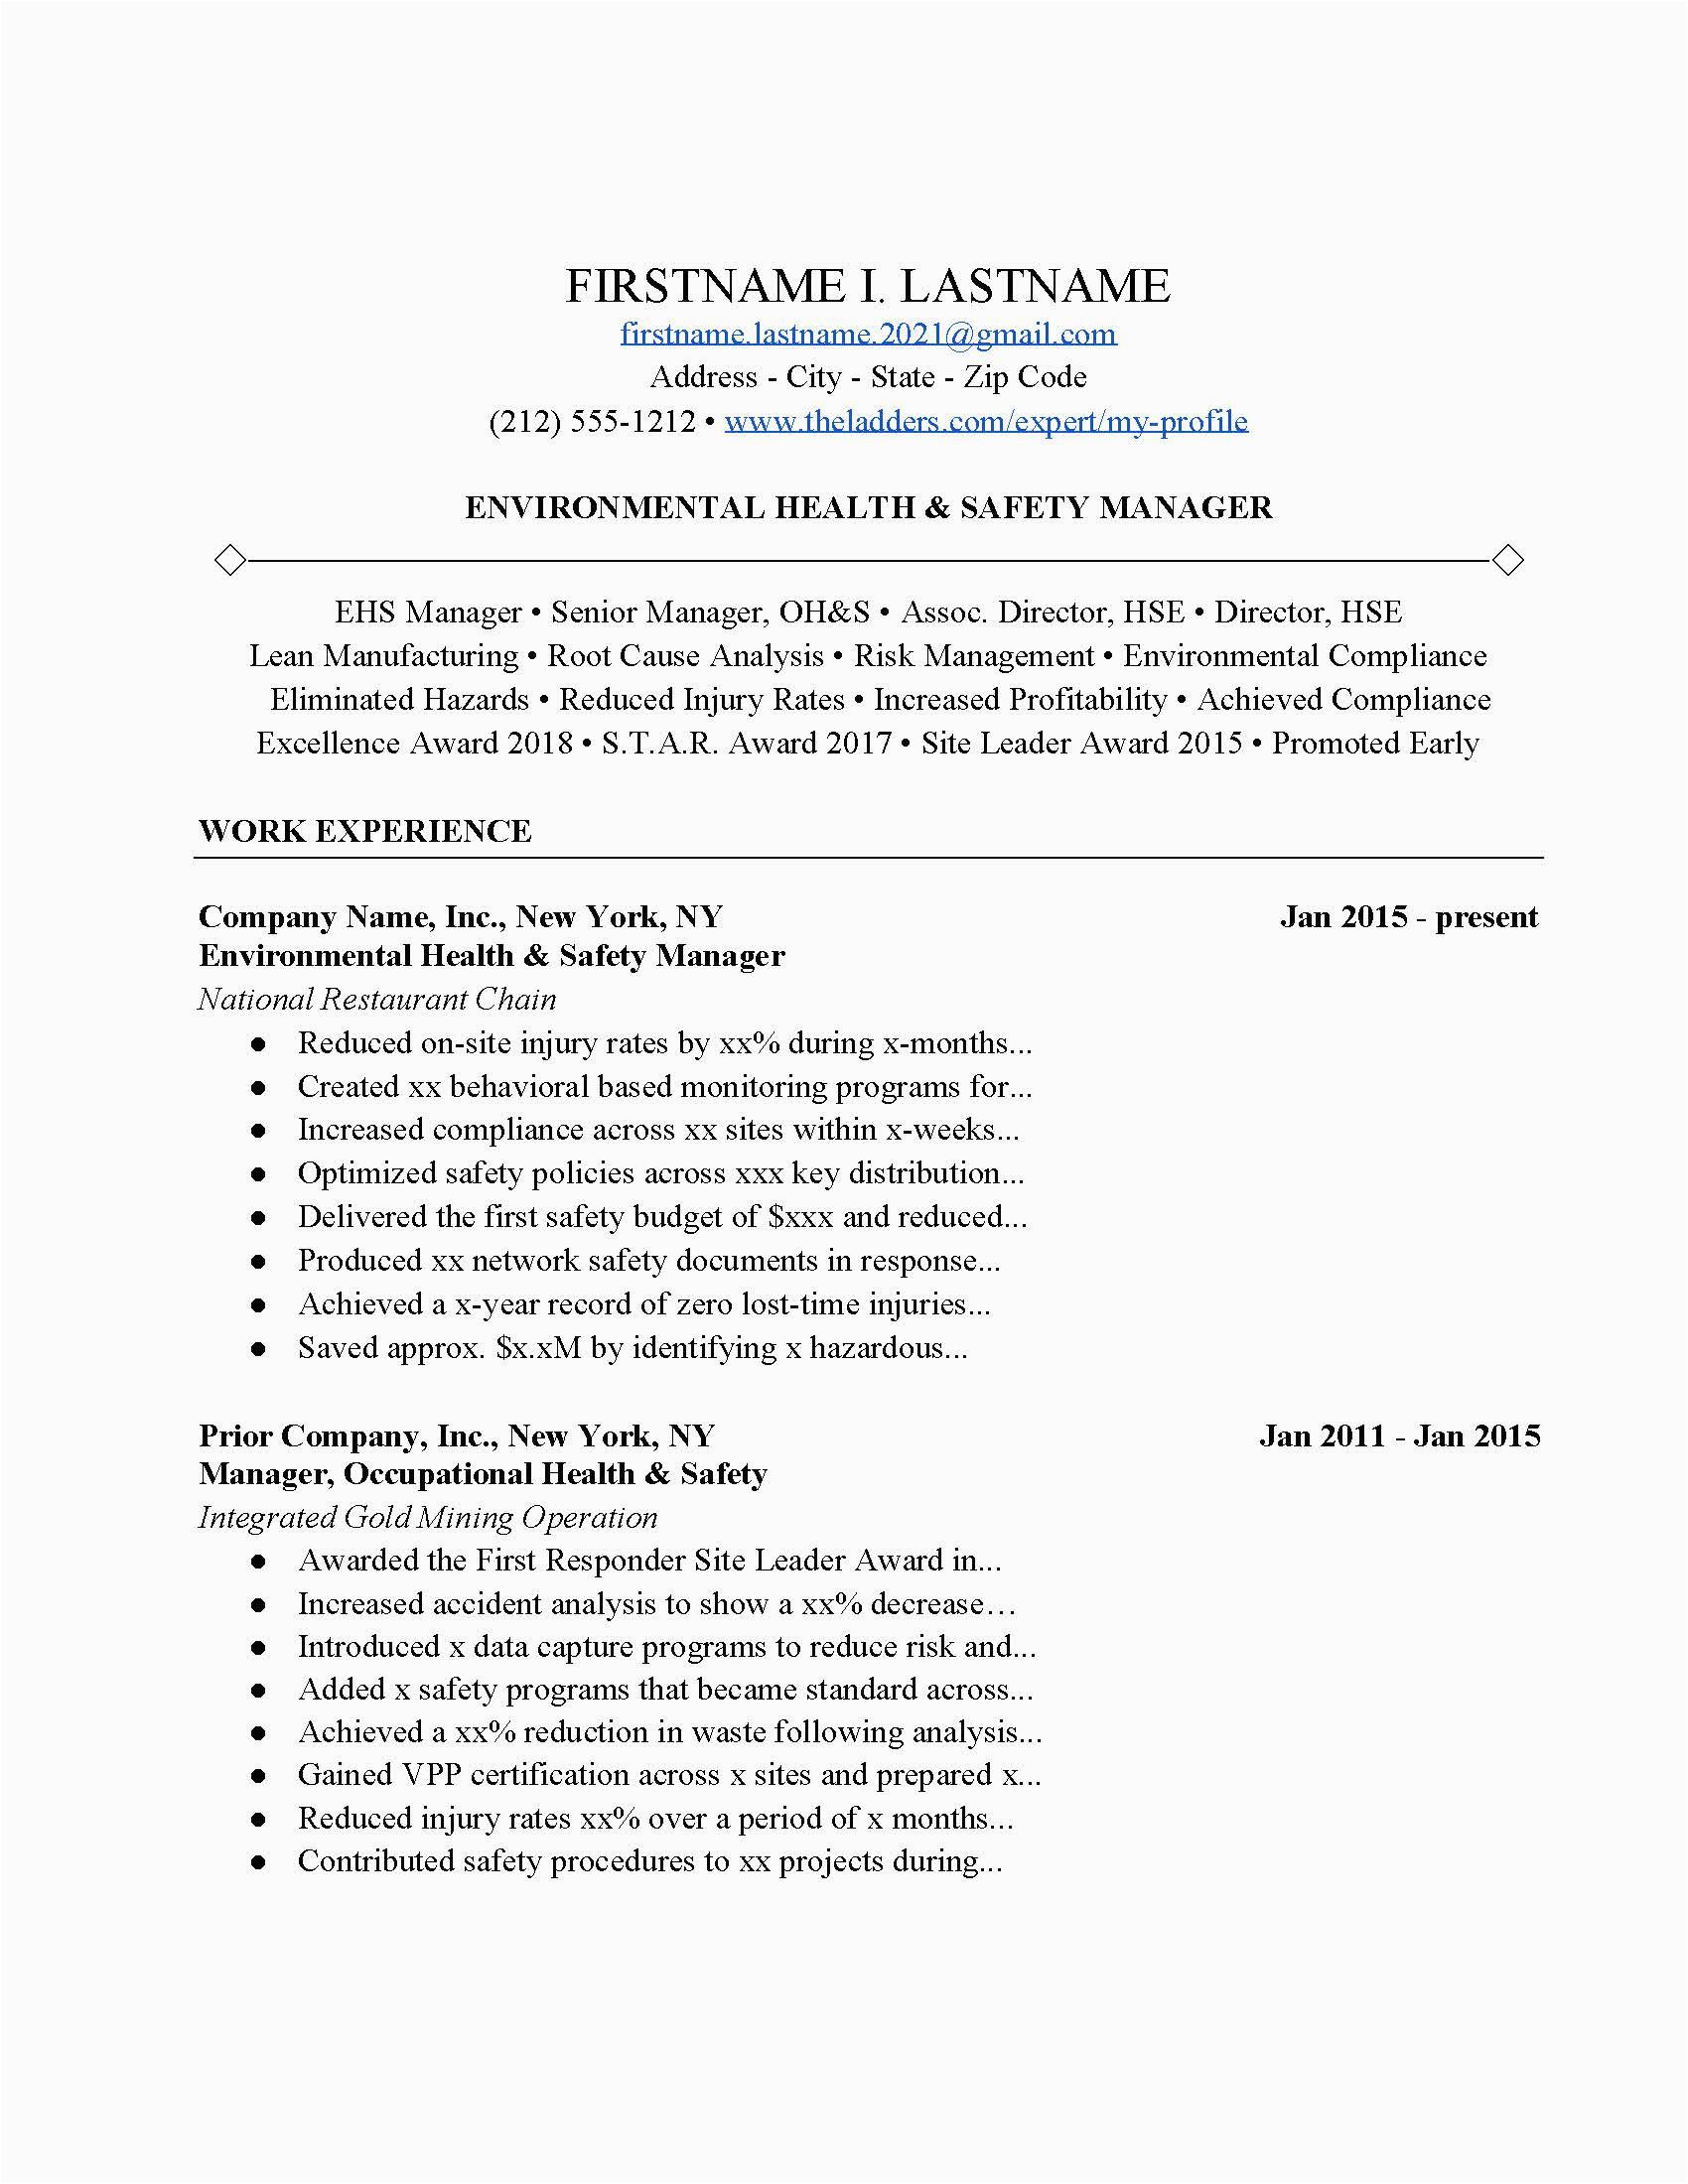 environmental health safety resume example